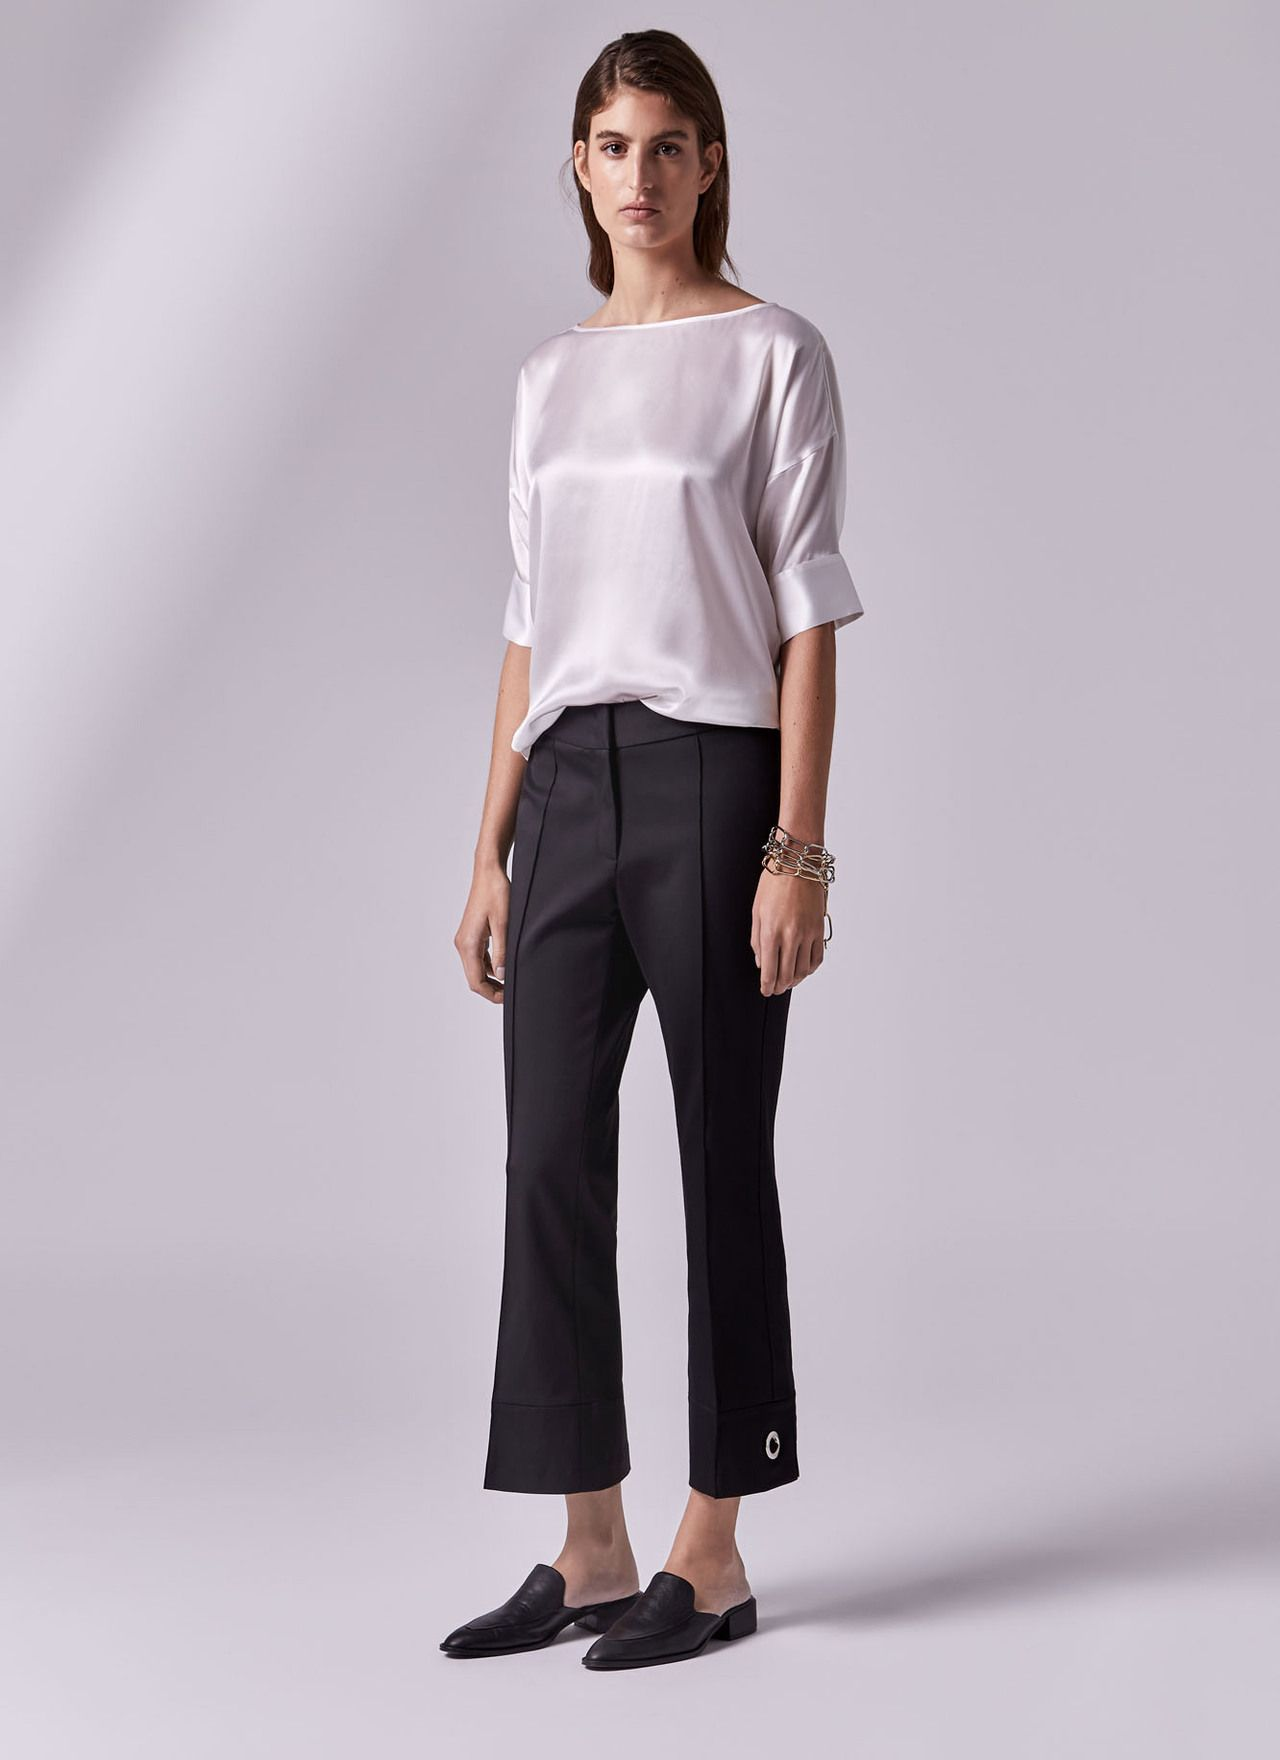 98b5d59d59e3 Blusa de seda con manga corta - Camisas y blusas | Adolfo Dominguez ...